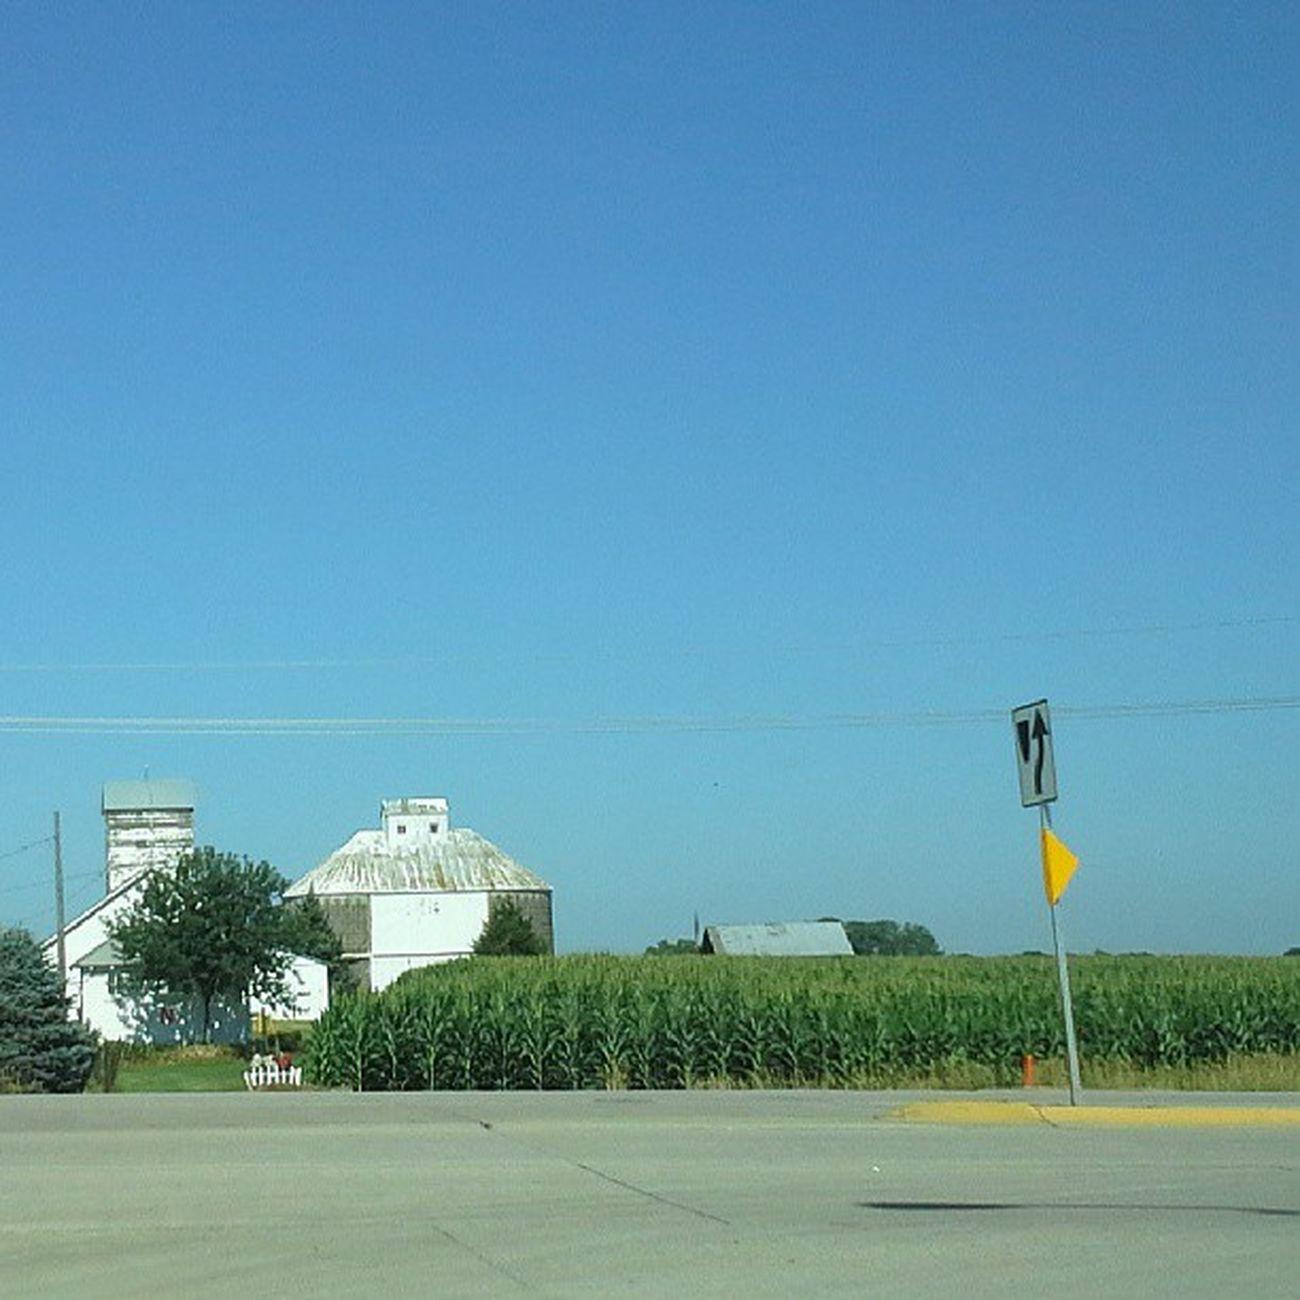 Highway Corn Roadtrip Farm Landscapes Nofilter Barns Bluesky Gretna Royalsnappingartists Rsa_rural Ig_ruralamerica Rsa_country Filthyfarms Almaproject Landscapealma Shotonthefly GretnaNebraska Almalandscape